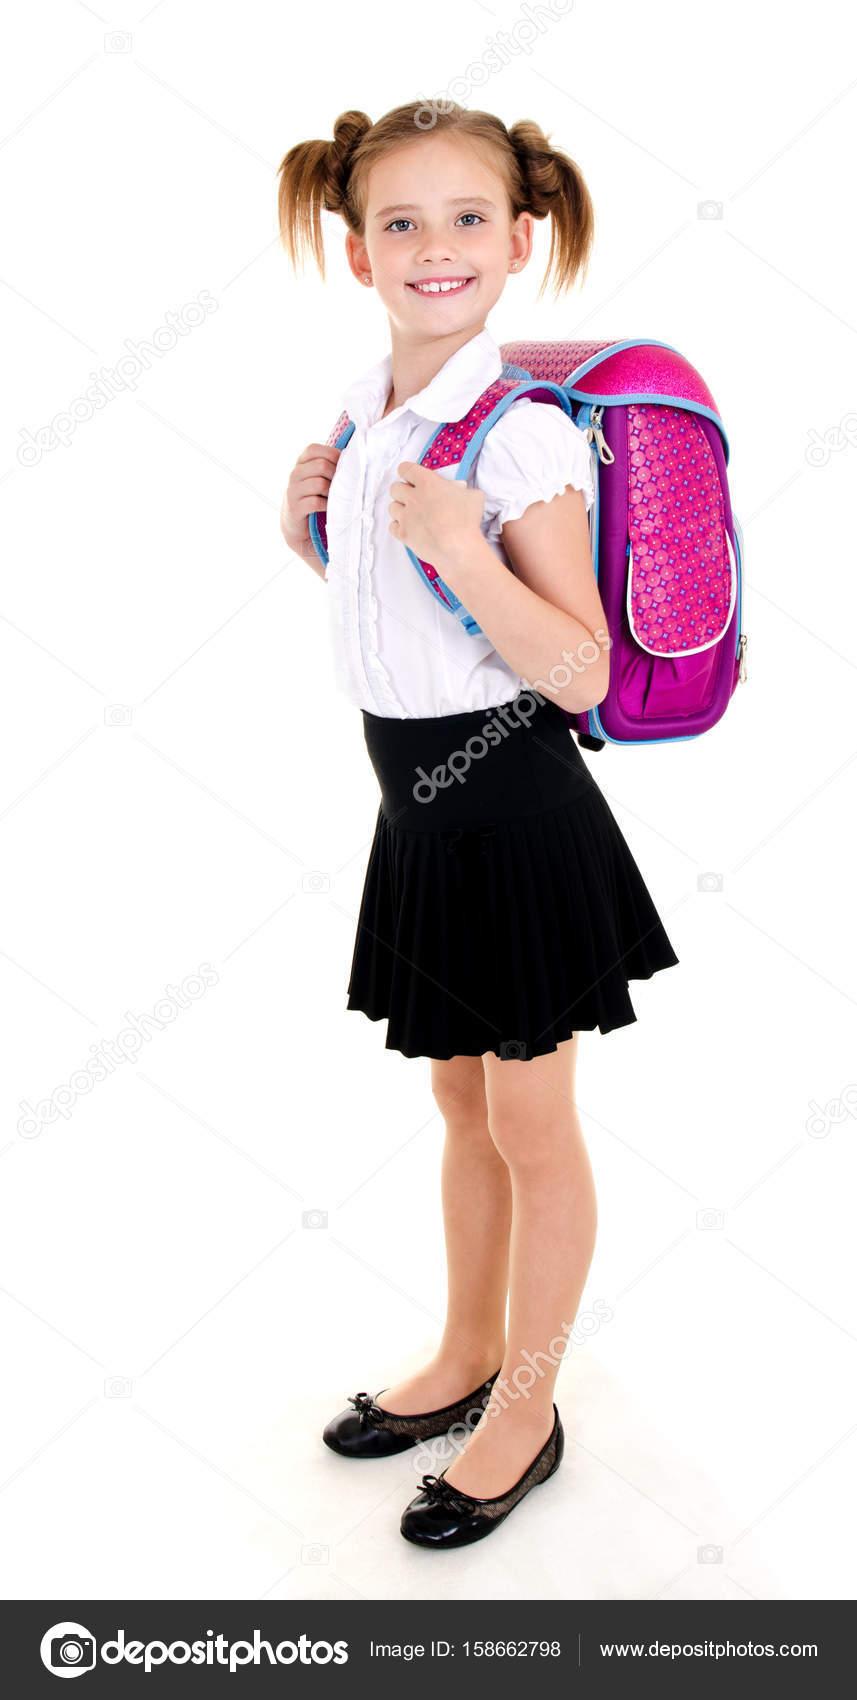 a15f8aa7d9b Πορτρέτο του χαμογελαστό παιδί κορίτσι σχολείο με το σακίδιο με τη στολή  που απομονώνονται σε λευκό φόντο — Εικόνα από ...